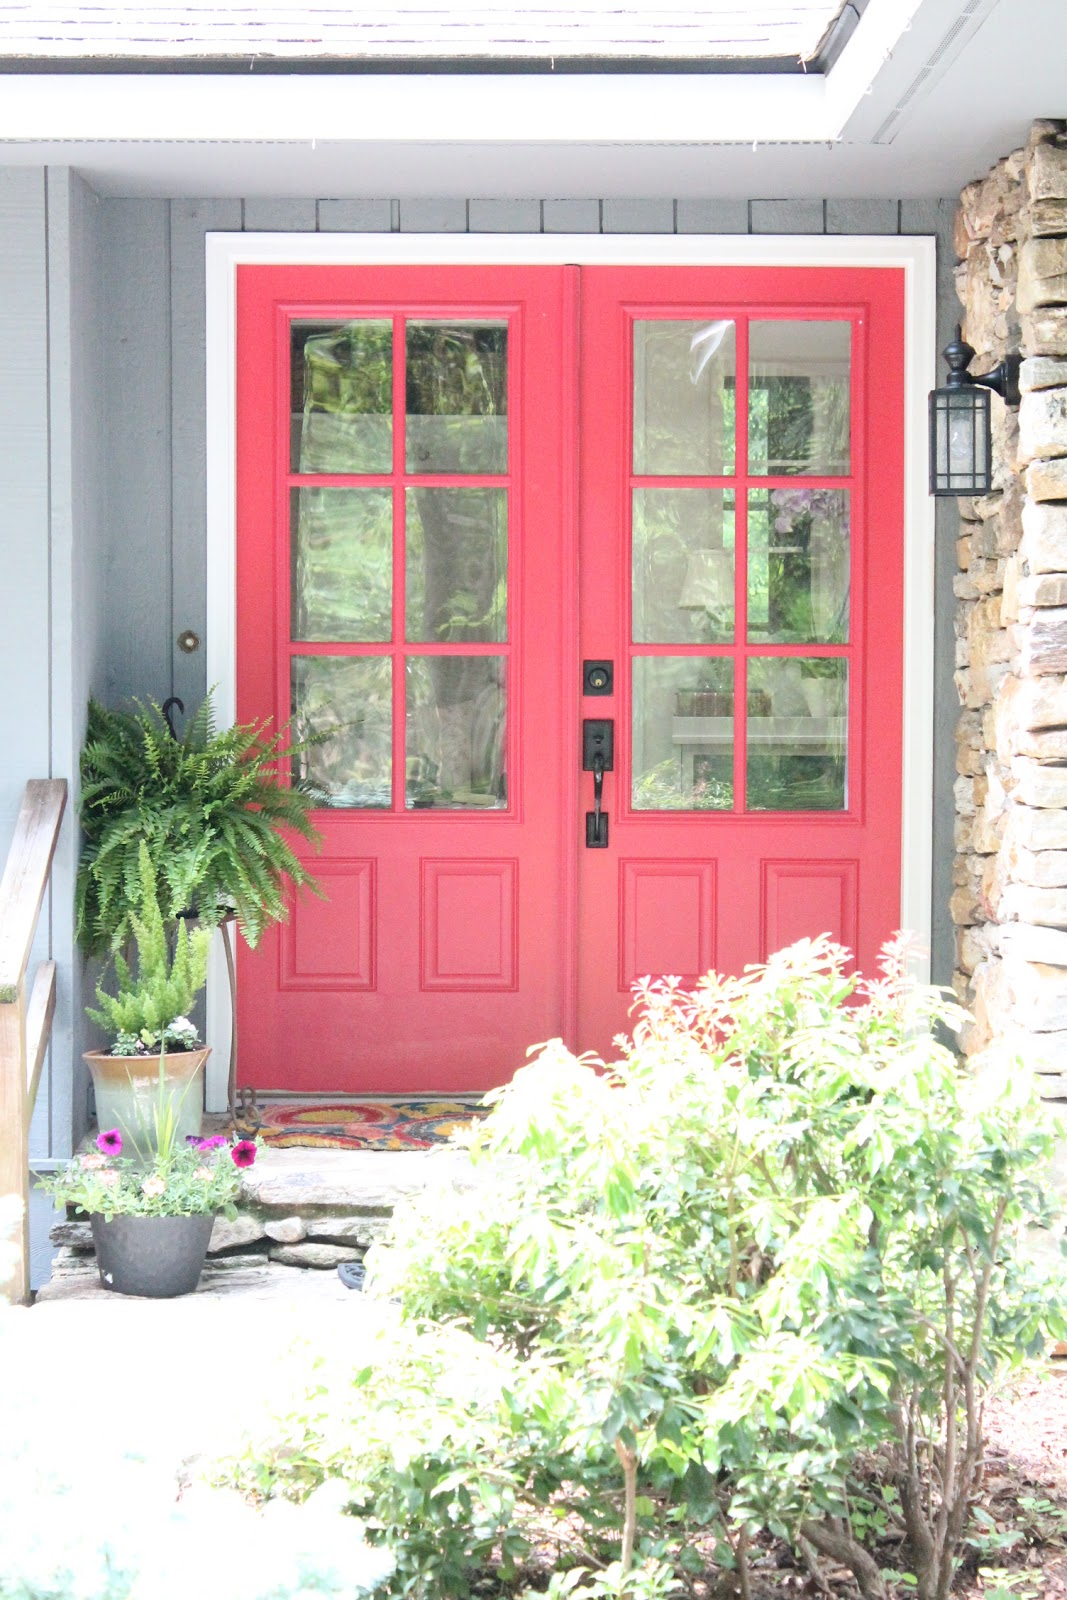 Woven Home: Hot Pink Front Door: Valspar Berry Blush